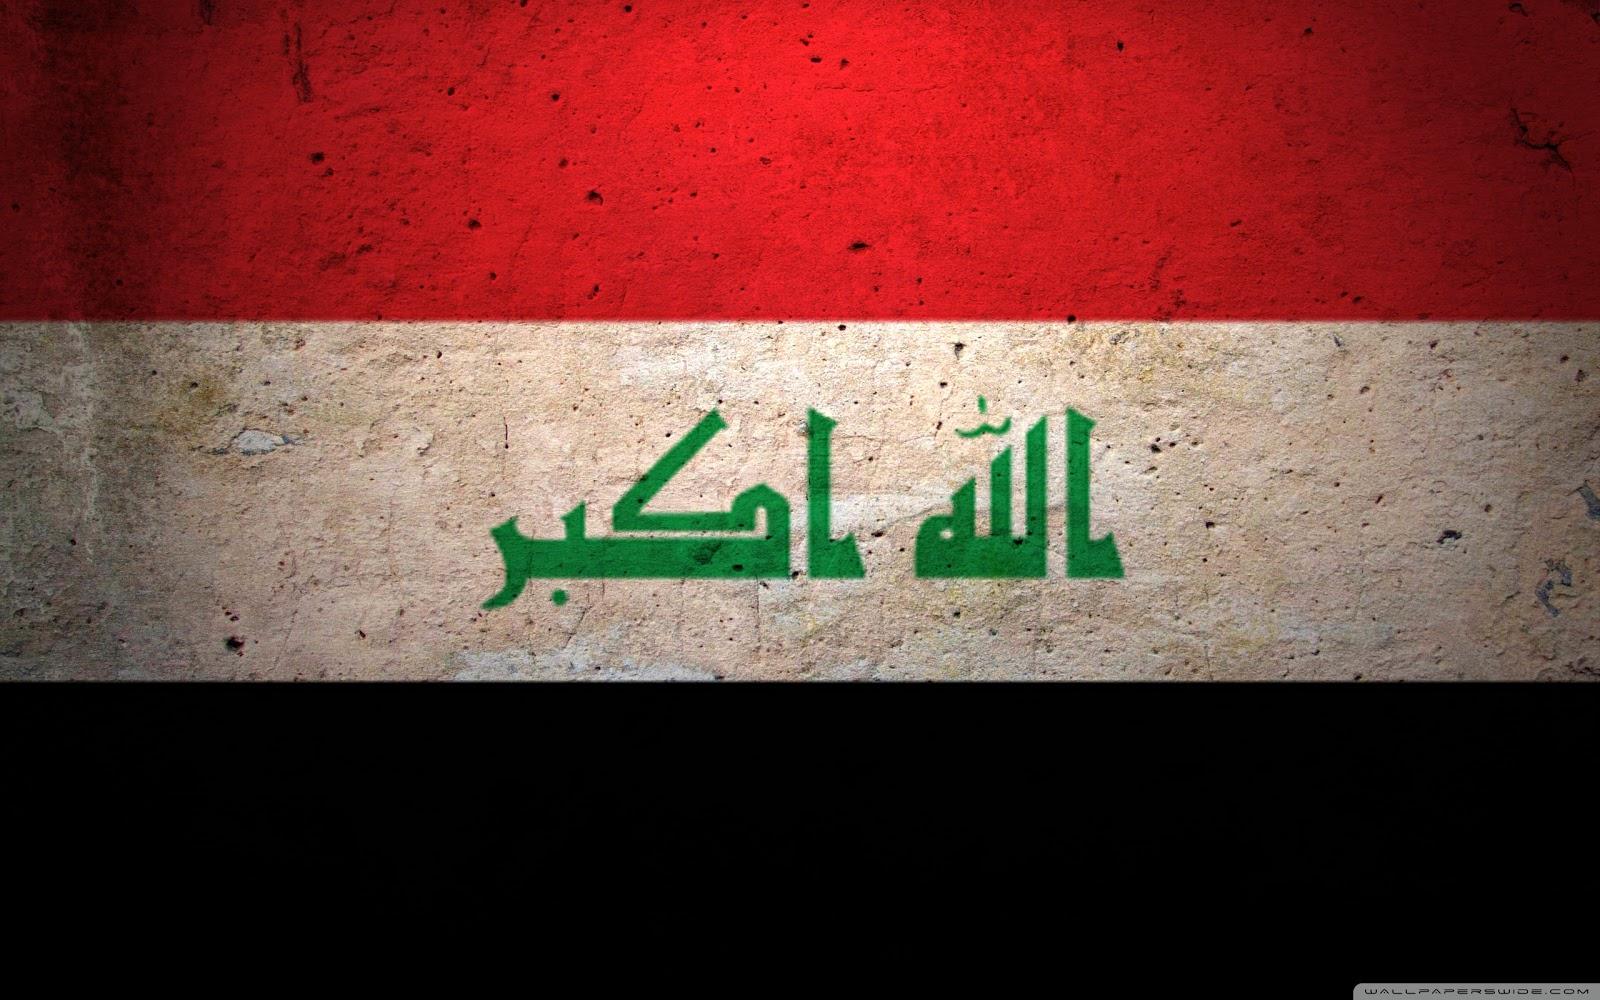 http://1.bp.blogspot.com/-Fc2yBSLlLuk/UJA17B2Jc0I/AAAAAAAAA78/5Ht6pR1HNNw/s1600/grunge_flag_of_iraq-wallpaper-2560x1600.jpg